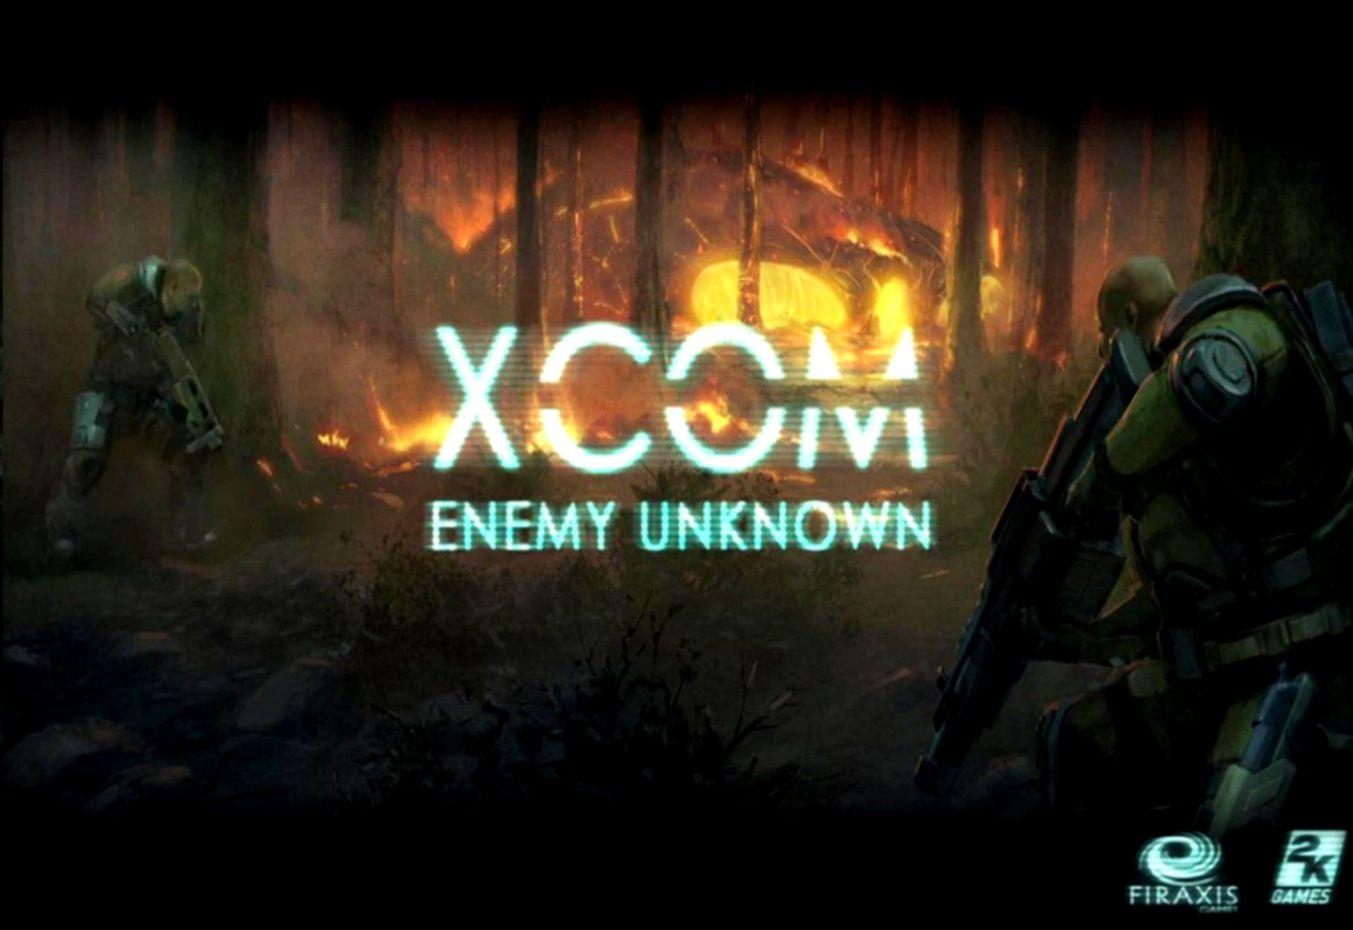 Free Download Xcom Enemy Unknown 2012 Gaming Wallpaper Joss